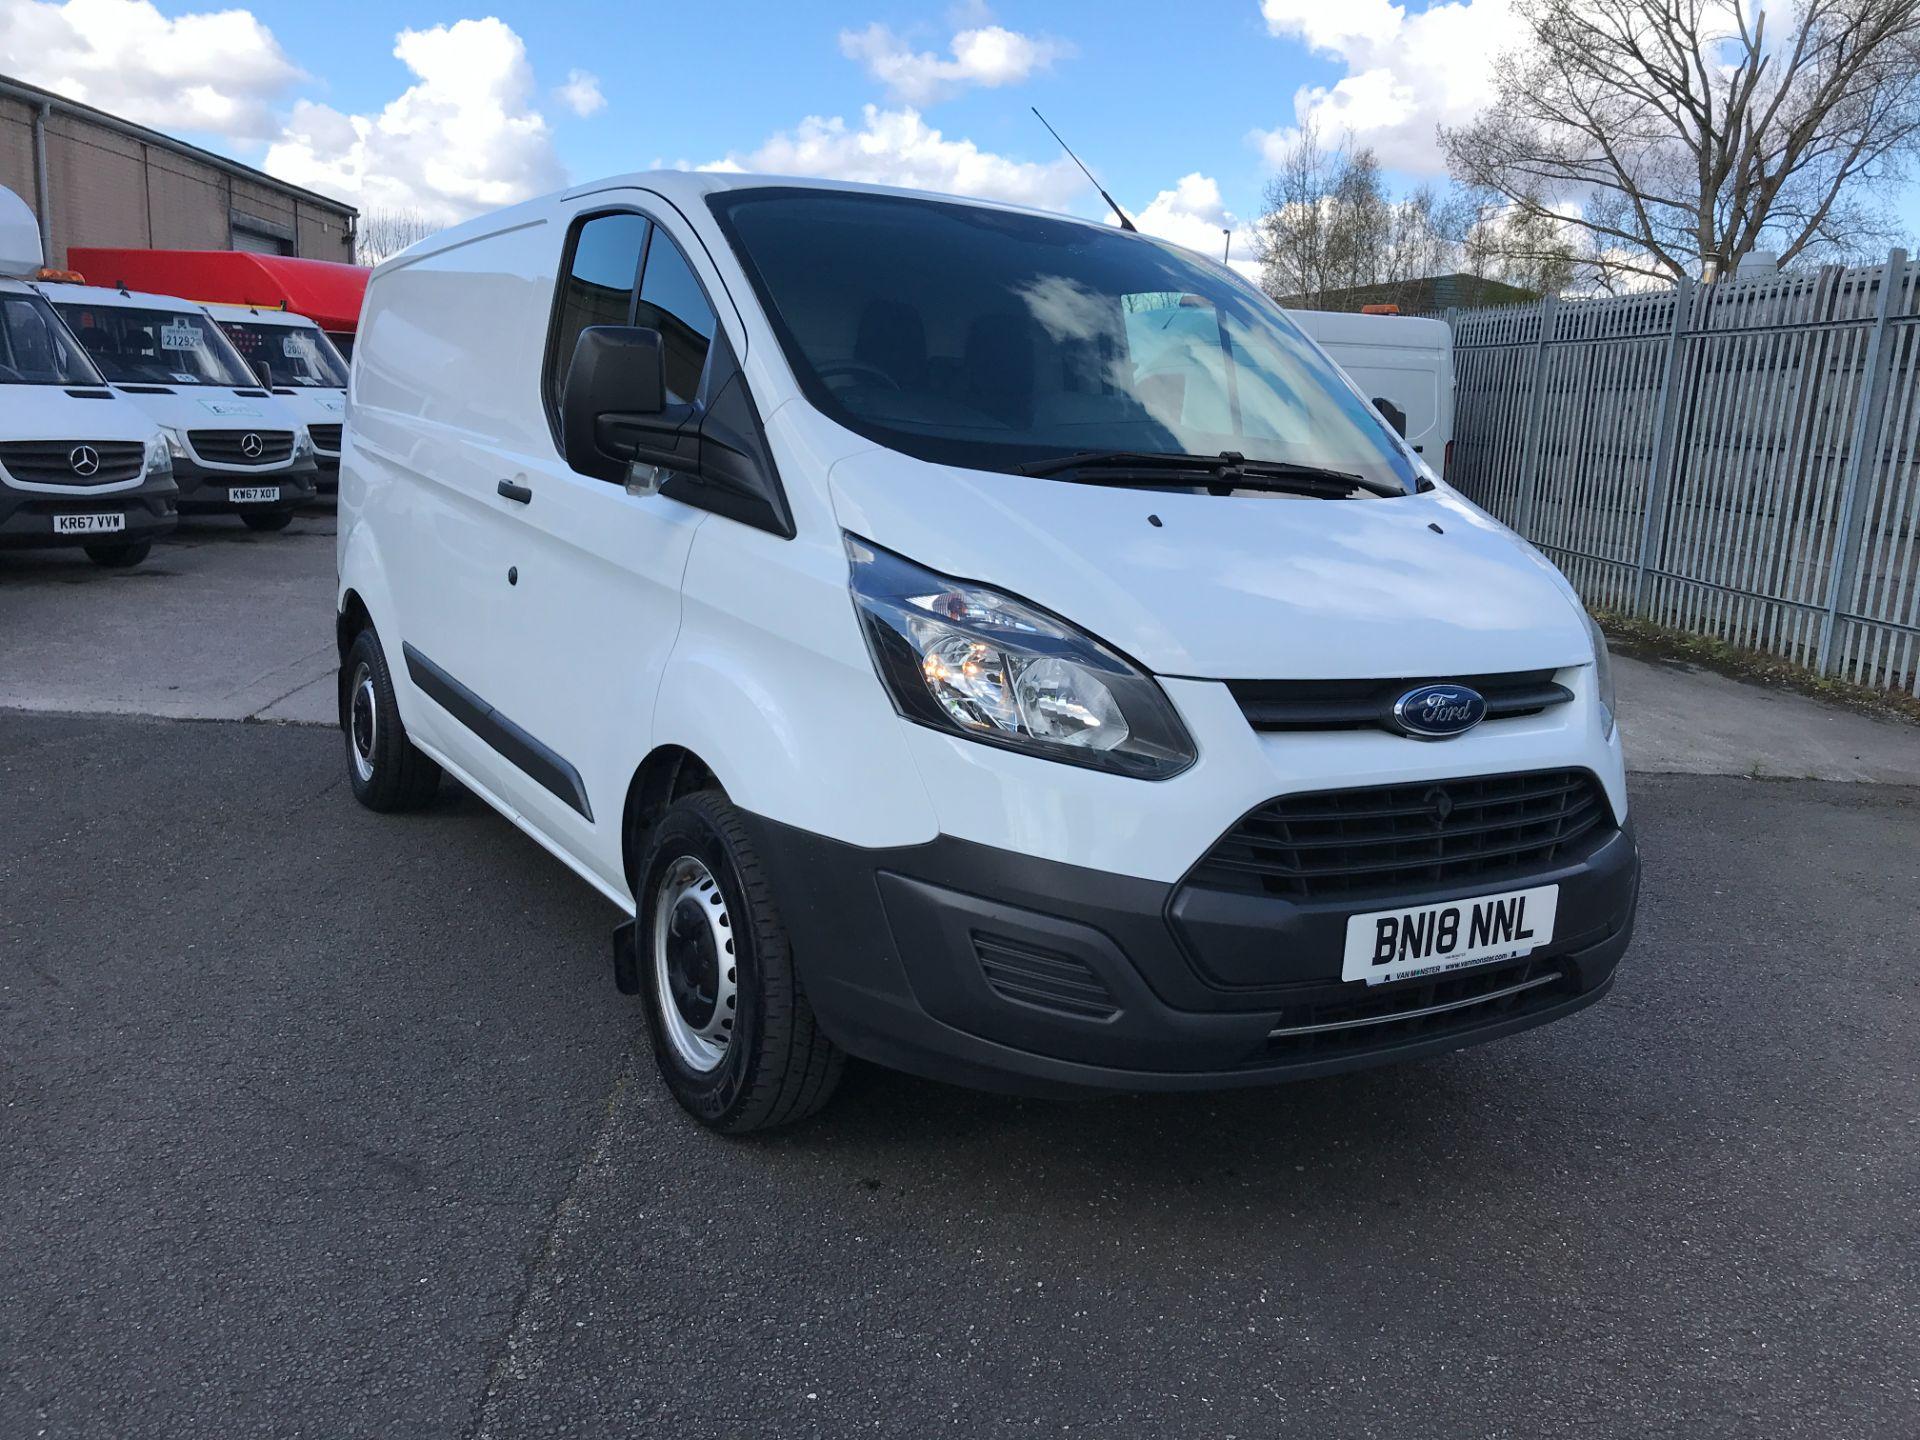 2018 Ford Transit Custom  290 L1 2.0TDCI 105PS LOW ROOF EURO 6 (BN18NNL)